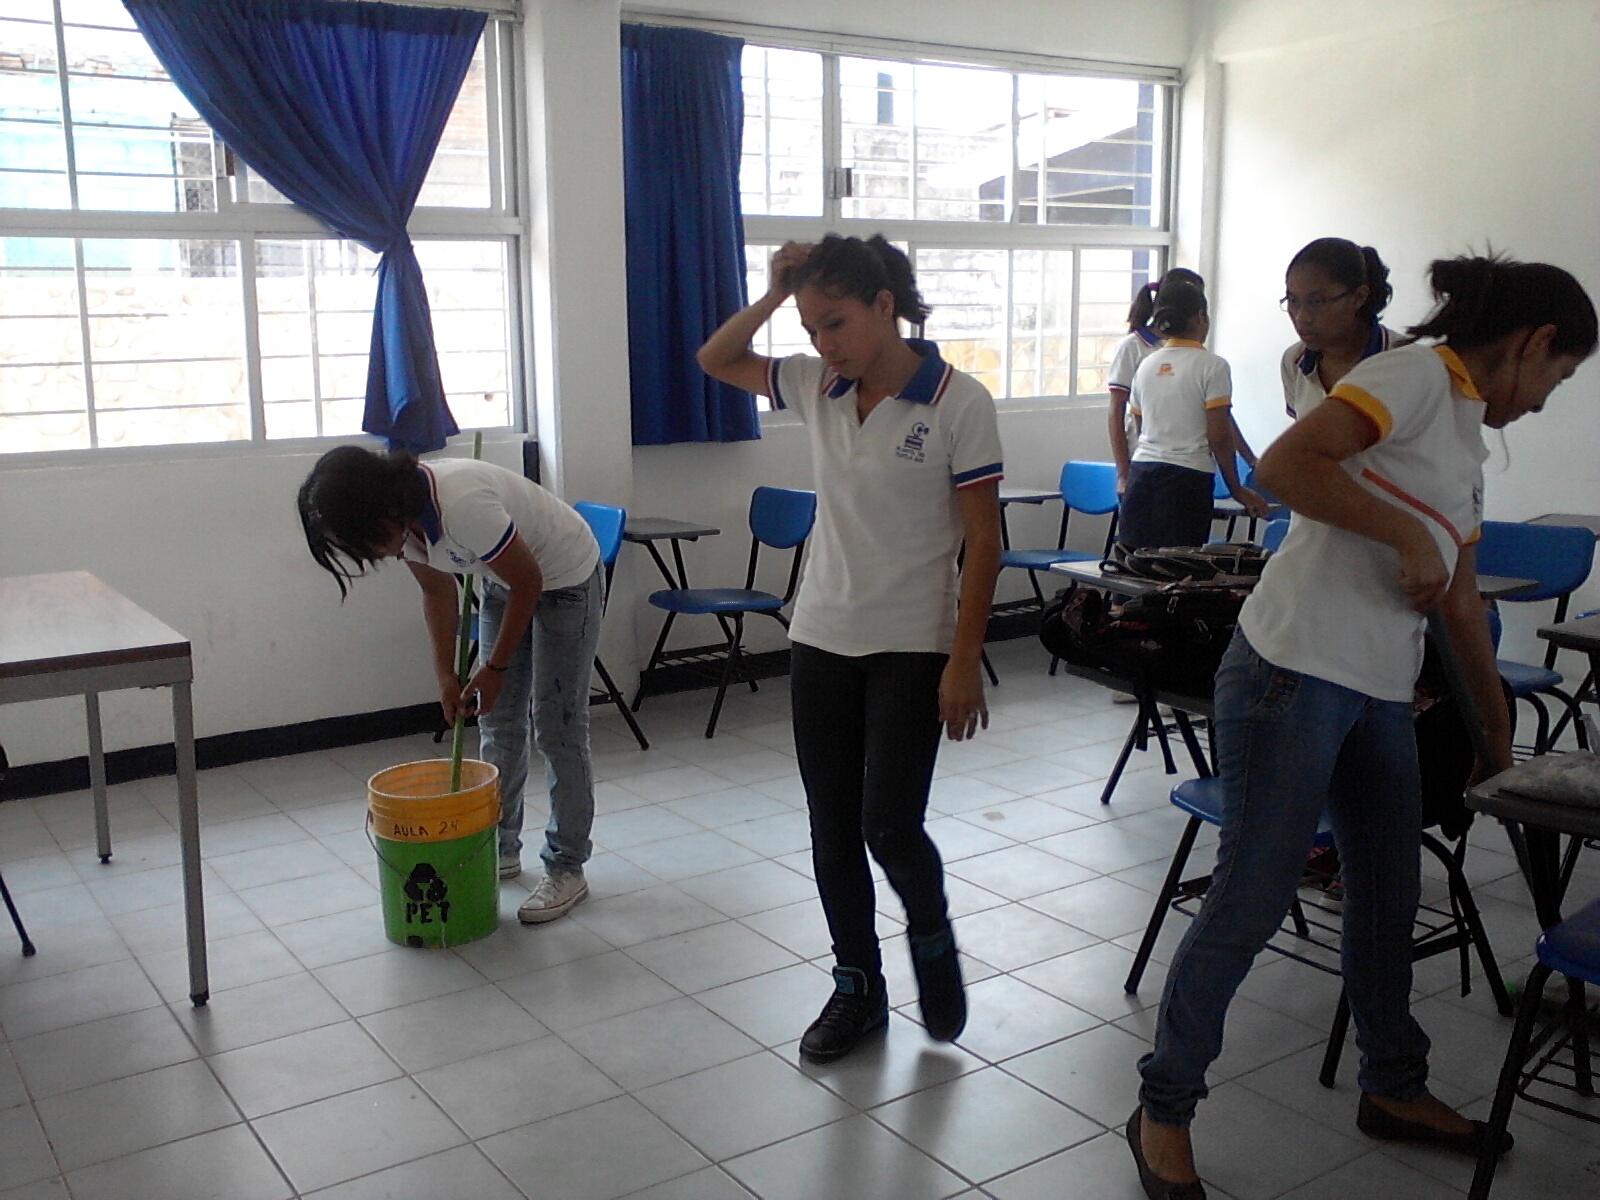 Educacion es innovar teacher octubre 2012 for Actividades para el salon de clases